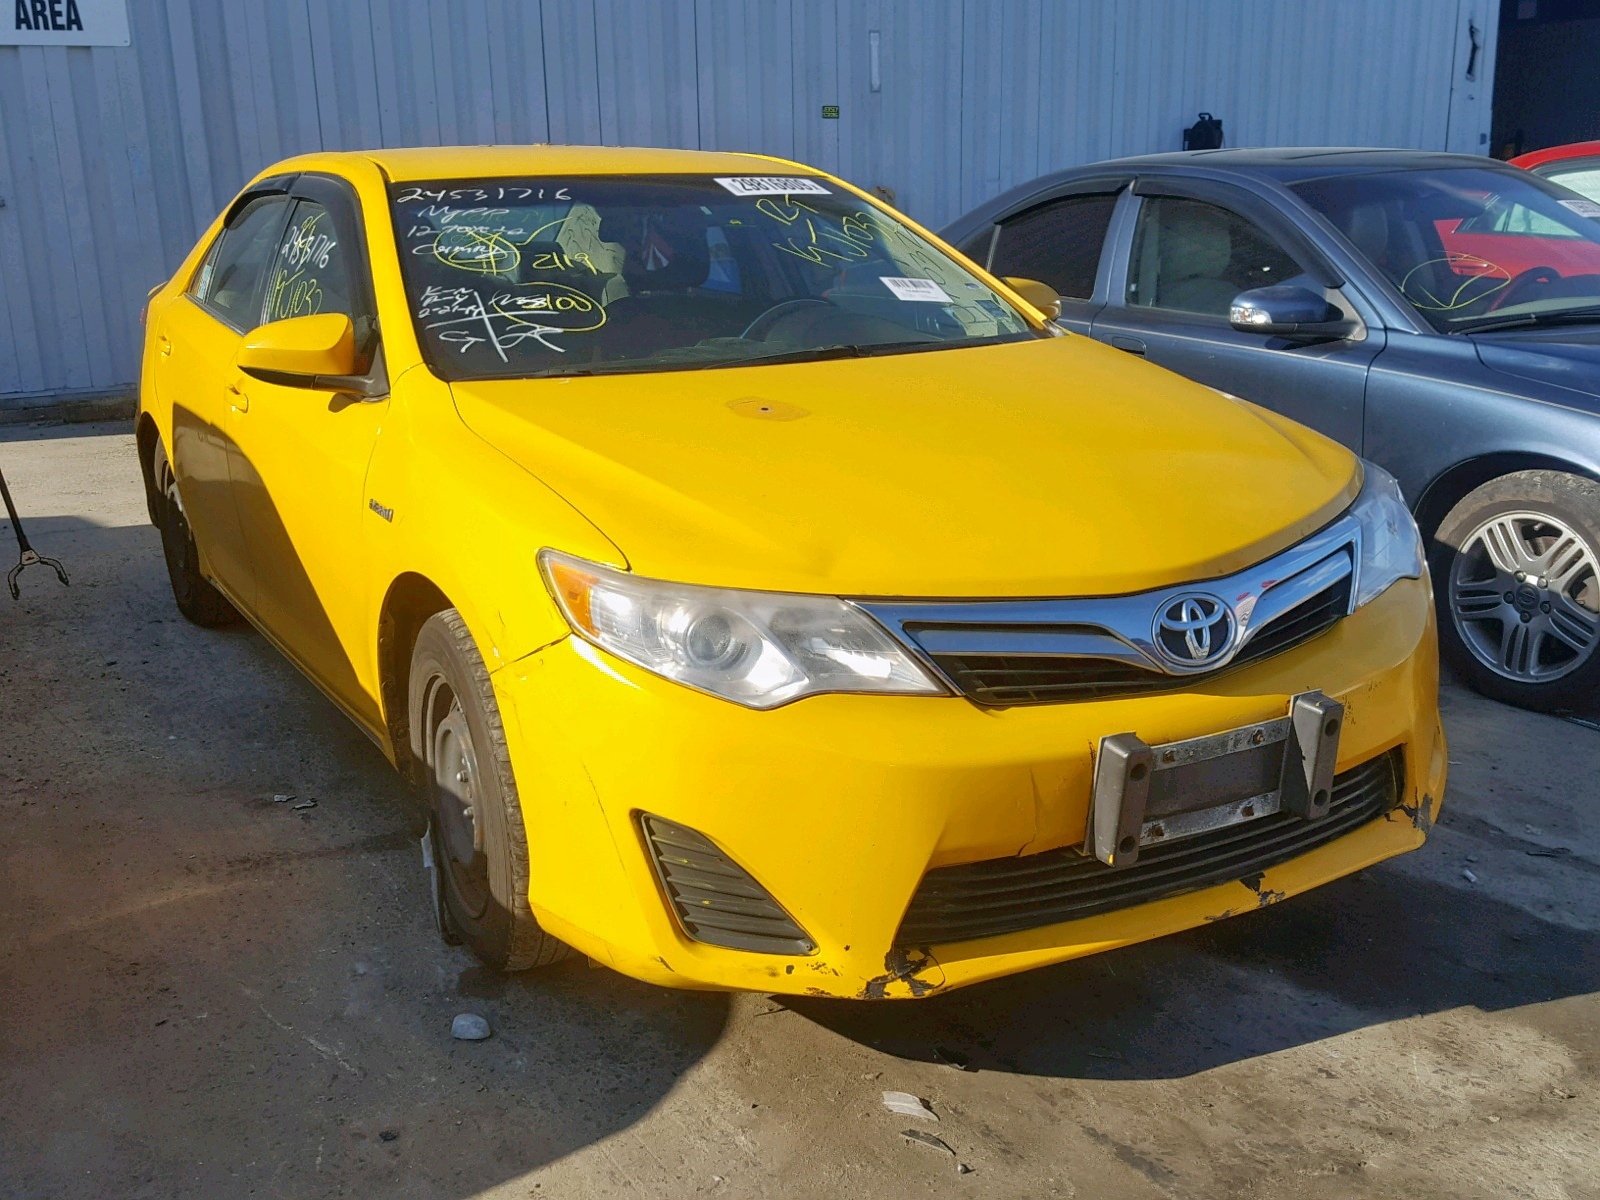 2012 Toyota Camry Hybr 2.5L Left View